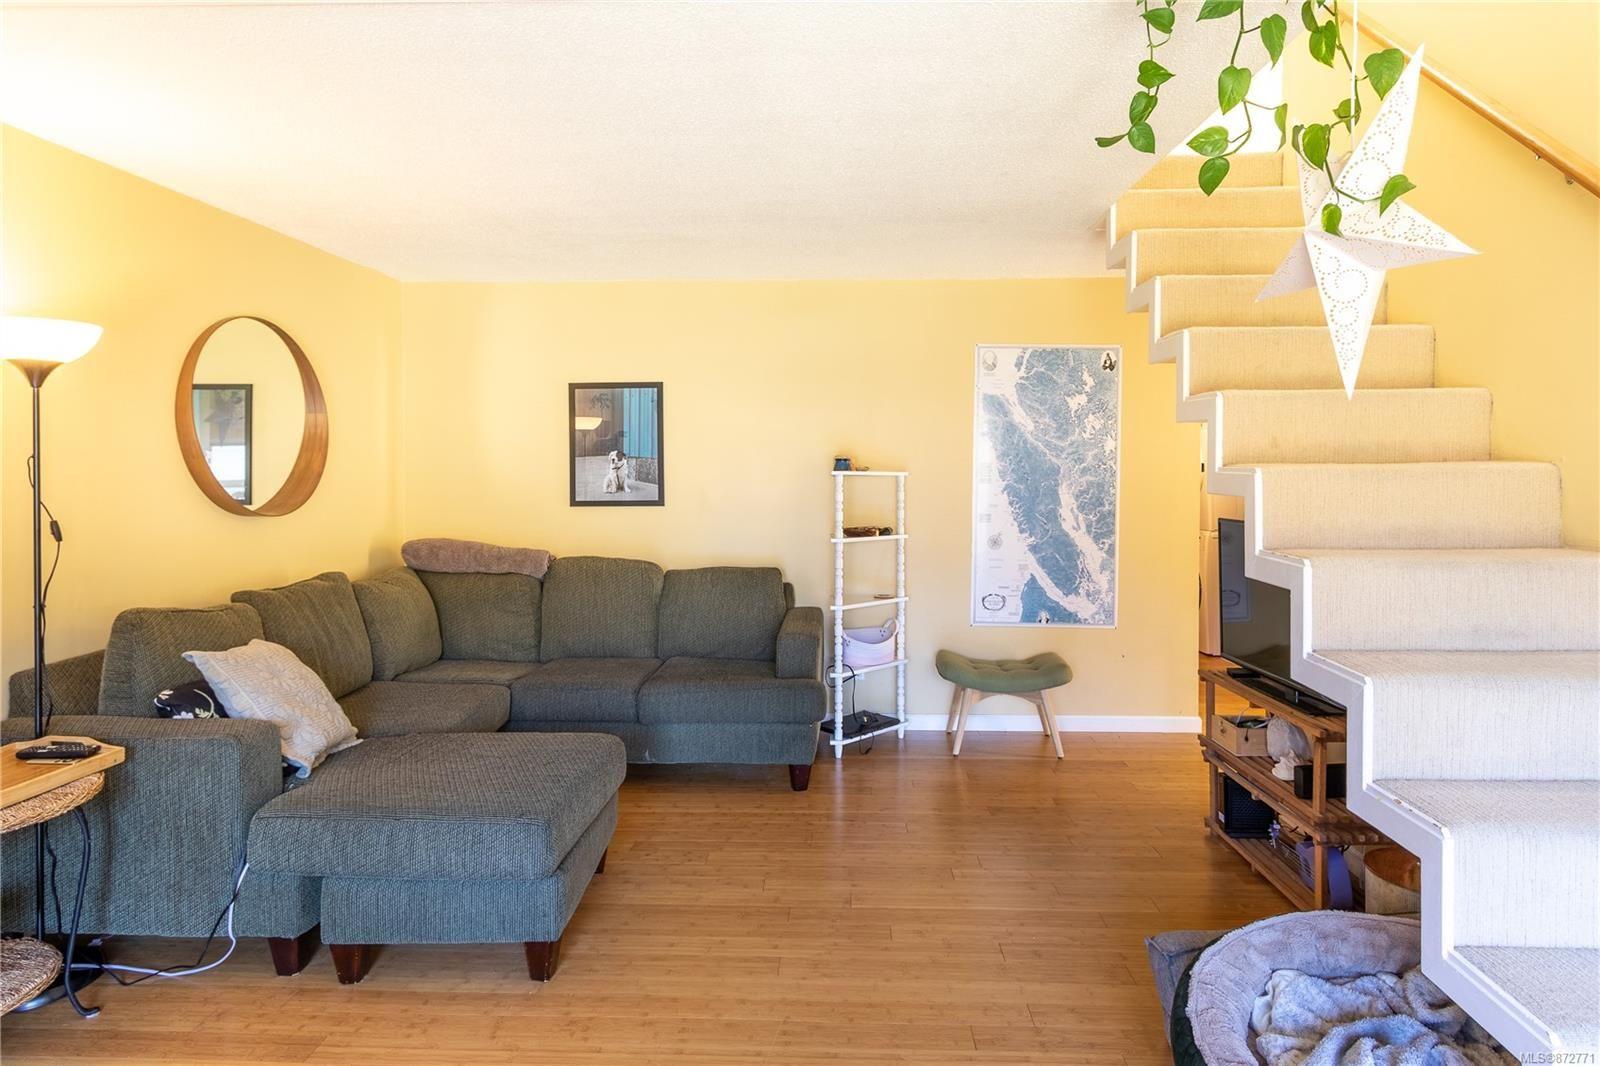 Photo 7: Photos: 305 205 1st St in : CV Courtenay City Condo for sale (Comox Valley)  : MLS®# 872771